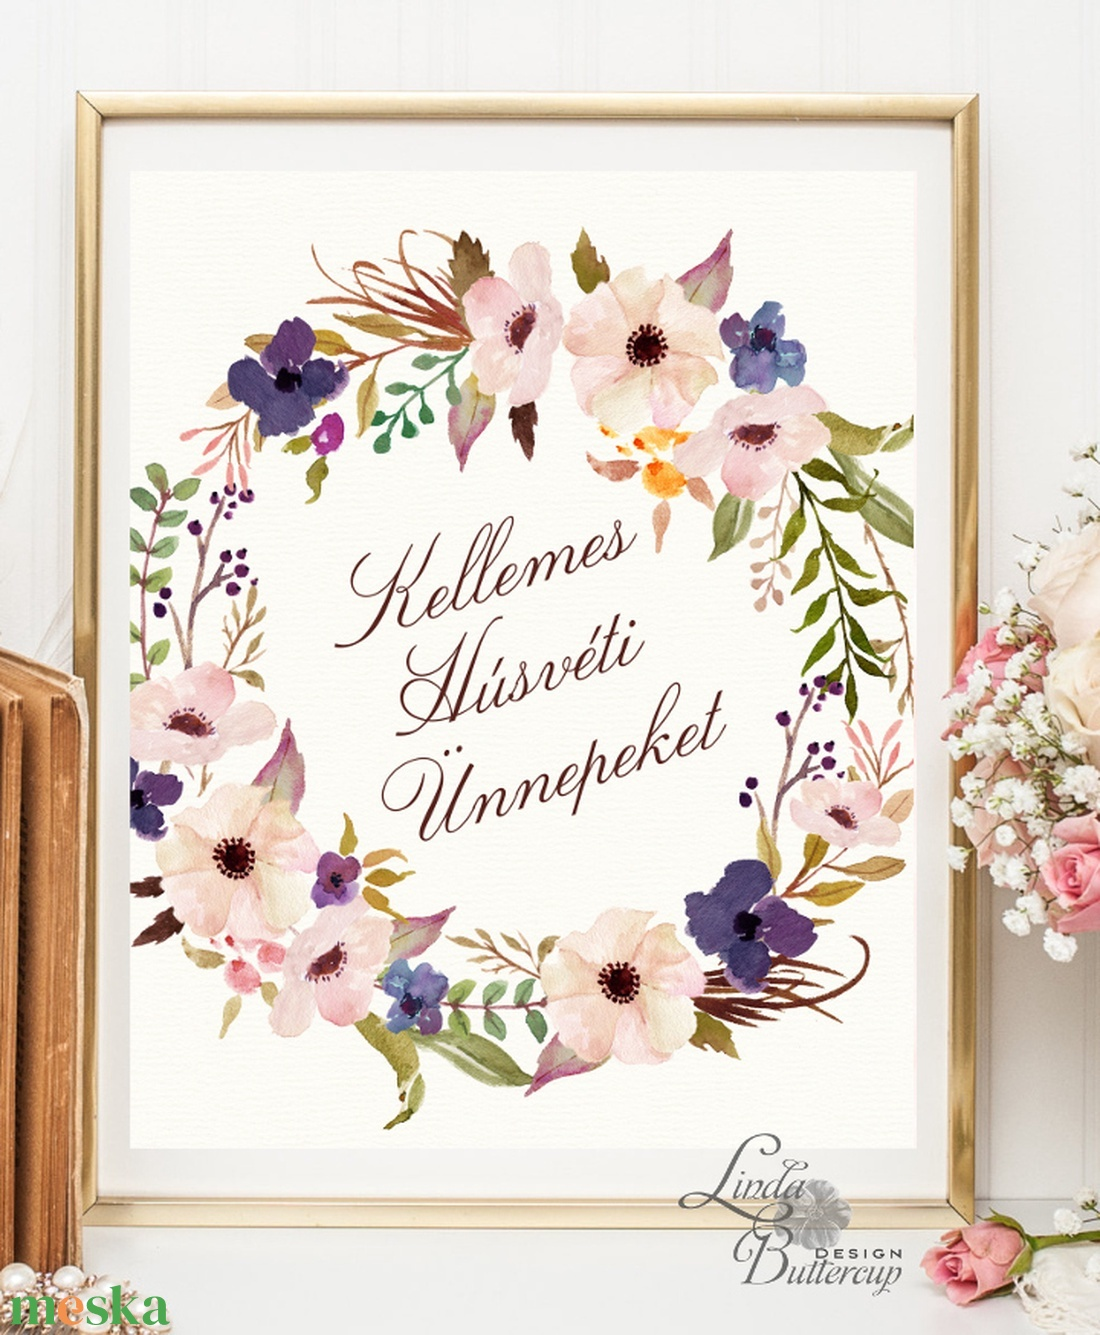 Tavaszi falikép, Húsvéti dekoráció, Húsvéti kép, Tavaszi virágok, virág koszorú, réti virág, vadvirág, nagy péntek (LindaButtercup) - Meska.hu